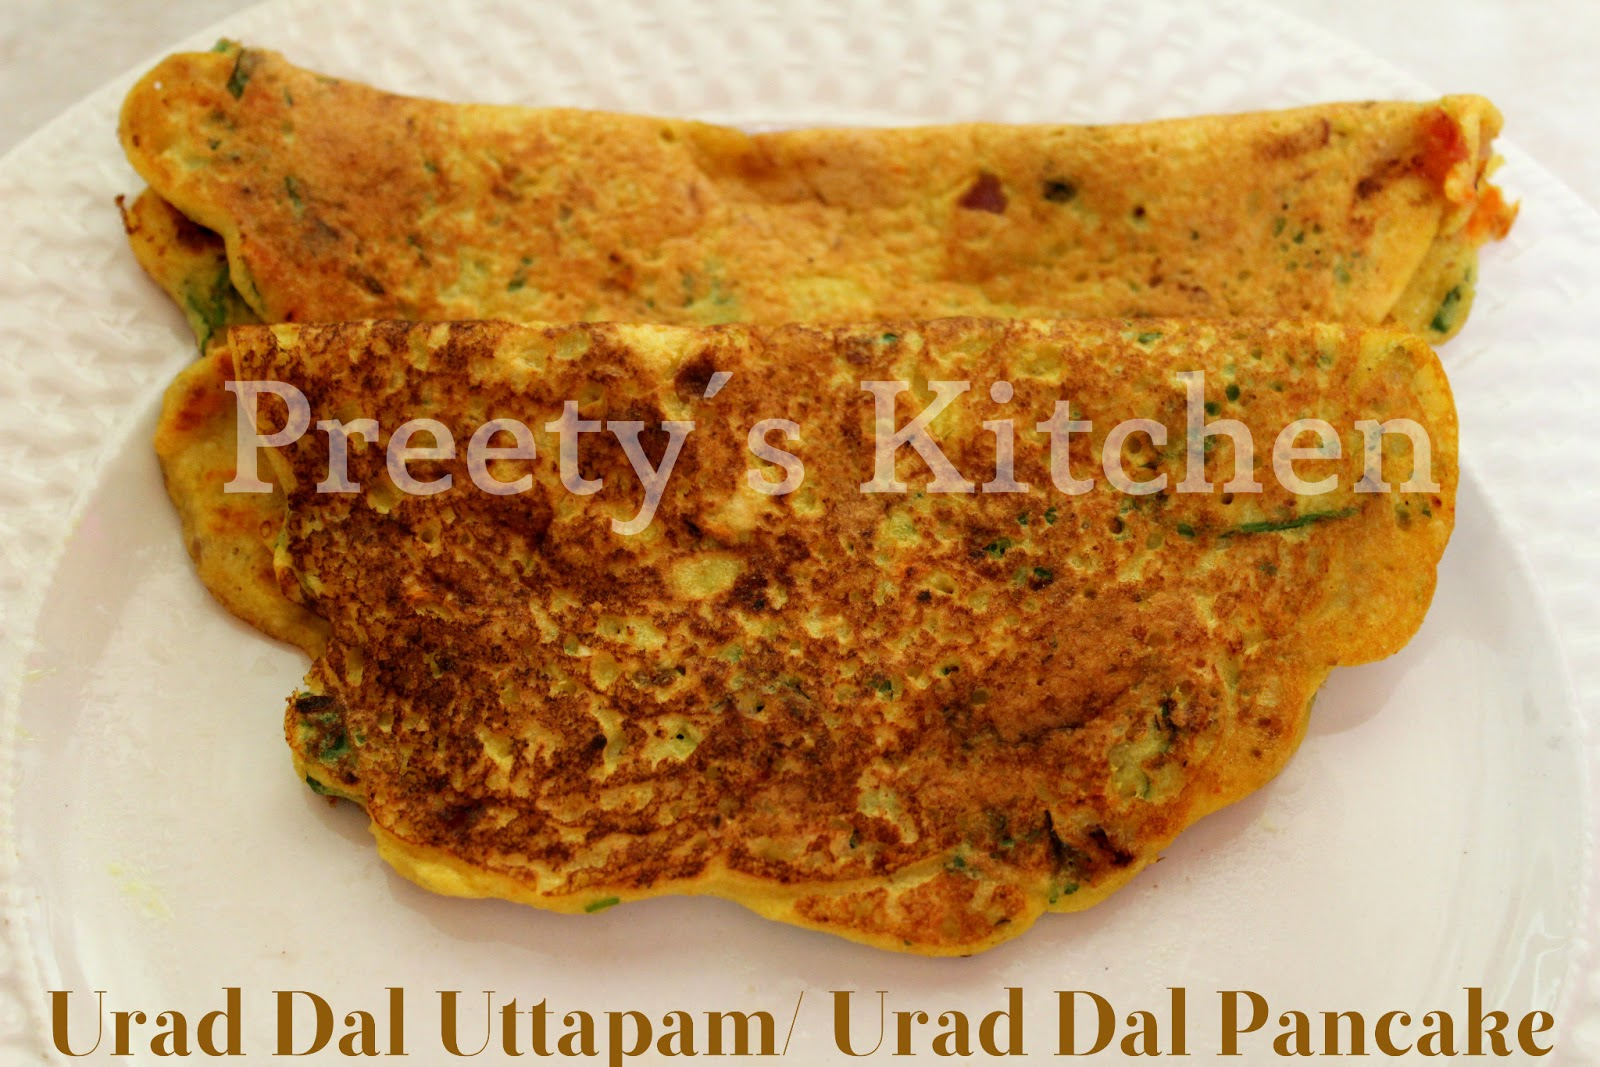 Urad Dal Uttapam   Urad Dal Pancake  Step By Step Recipe Urad Dal Recipe